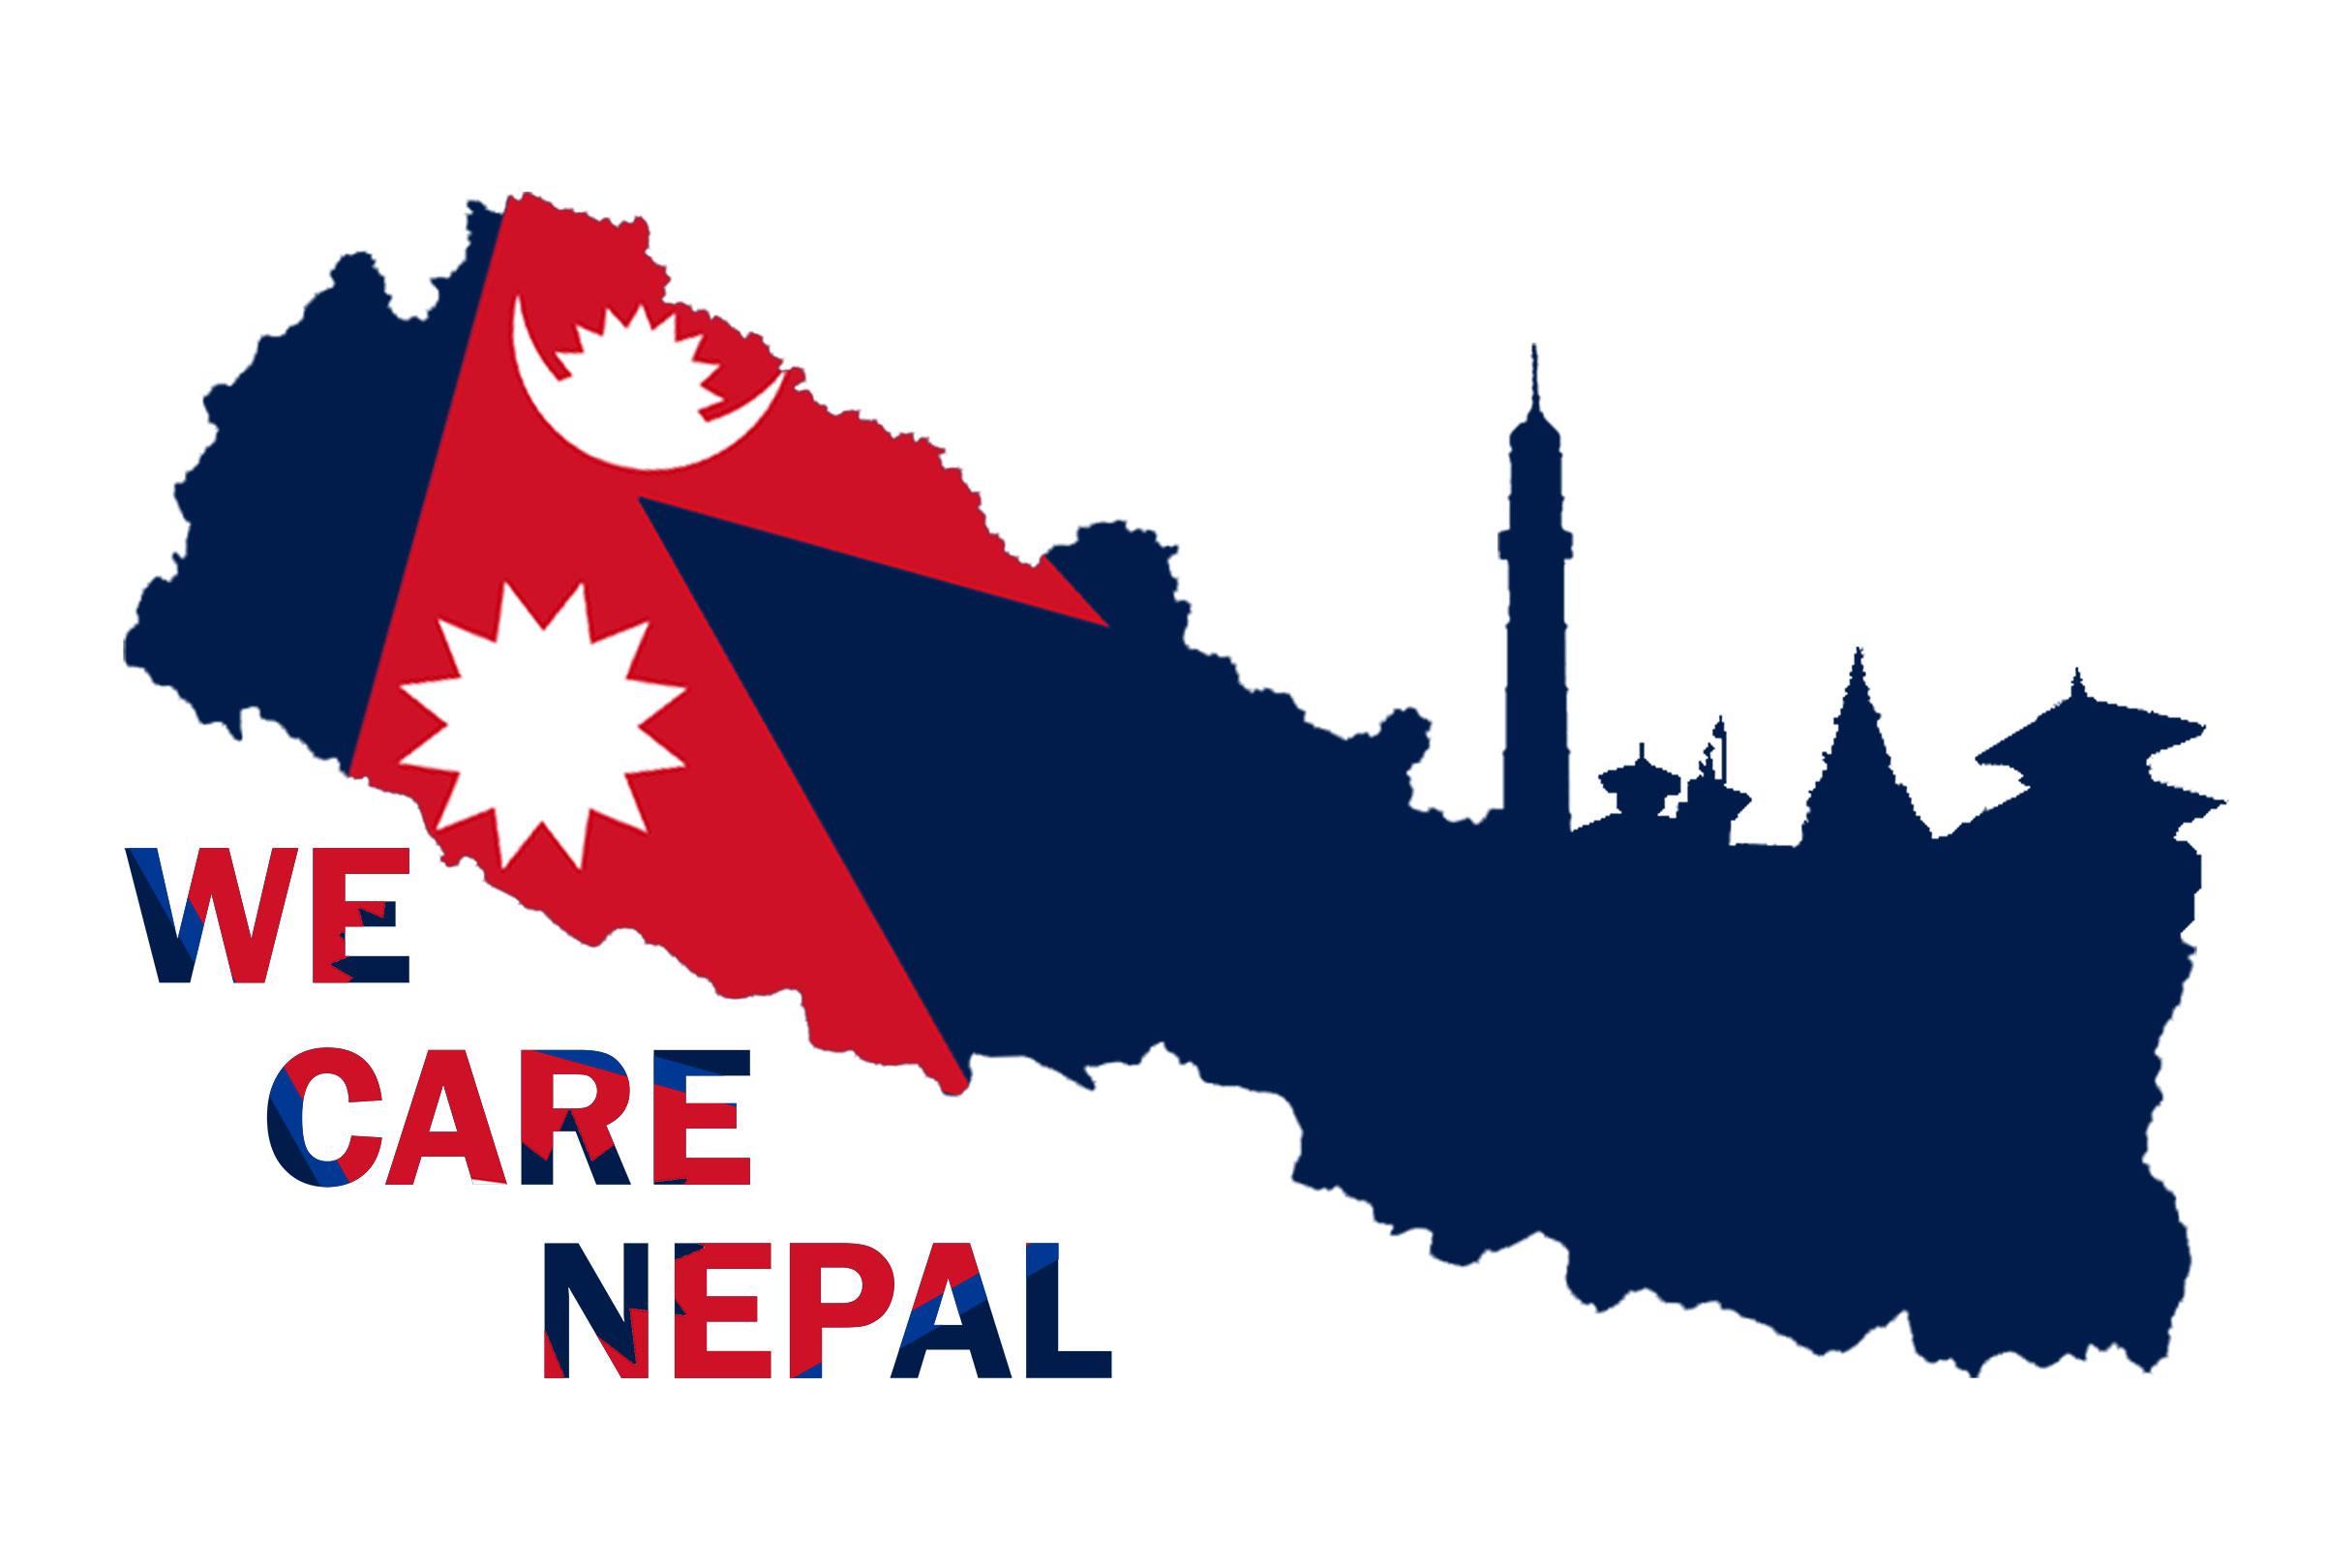 we care nepal